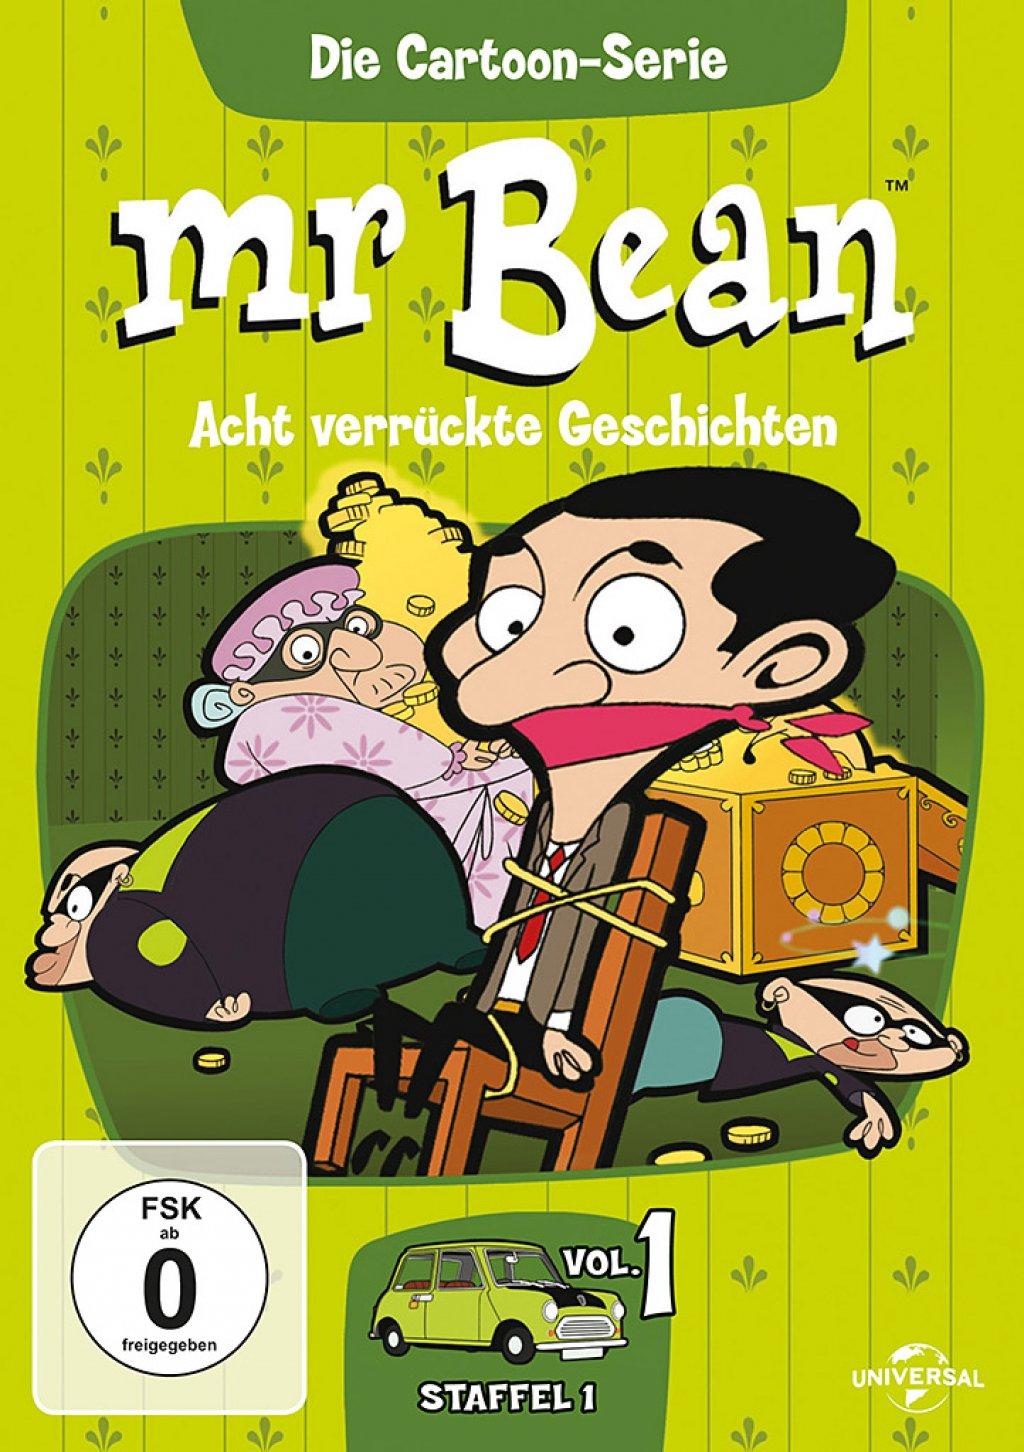 Mr. Bean - Die Cartoon Serie - Staffel 1 / Vol. 1 (DVD)